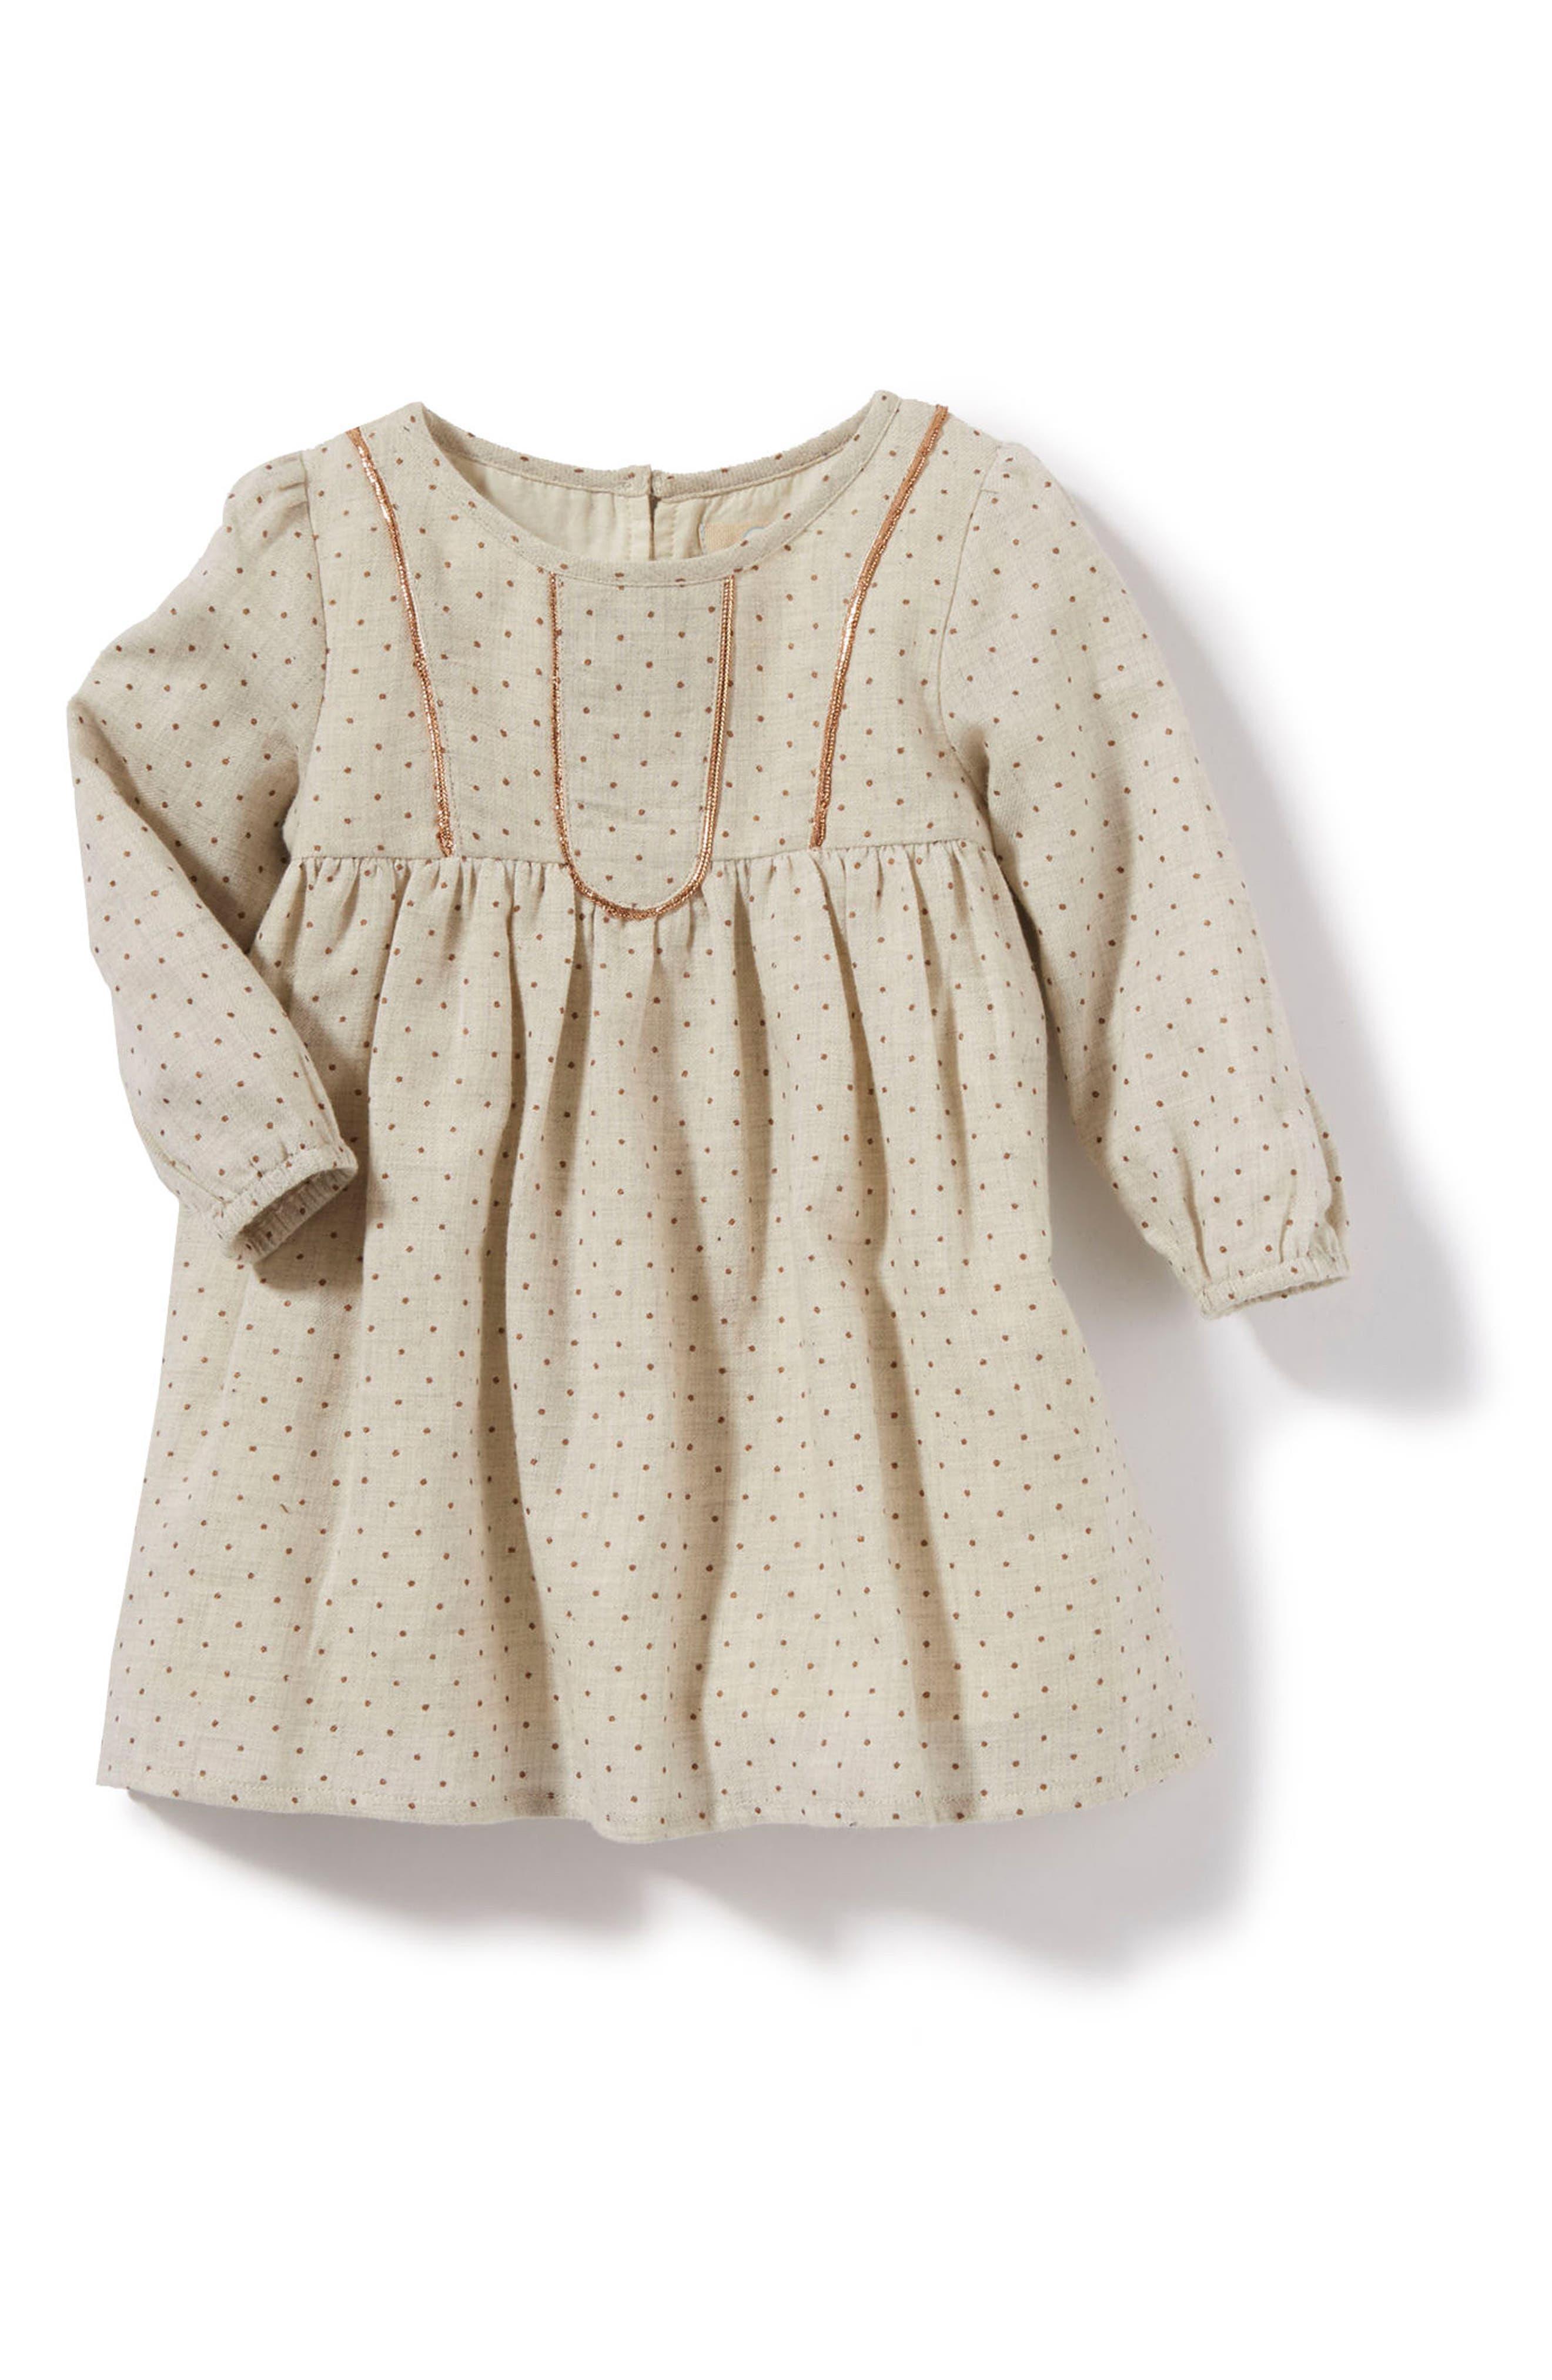 Alternate Image 1 Selected - Peek Scarlet Dress (Baby Girls)